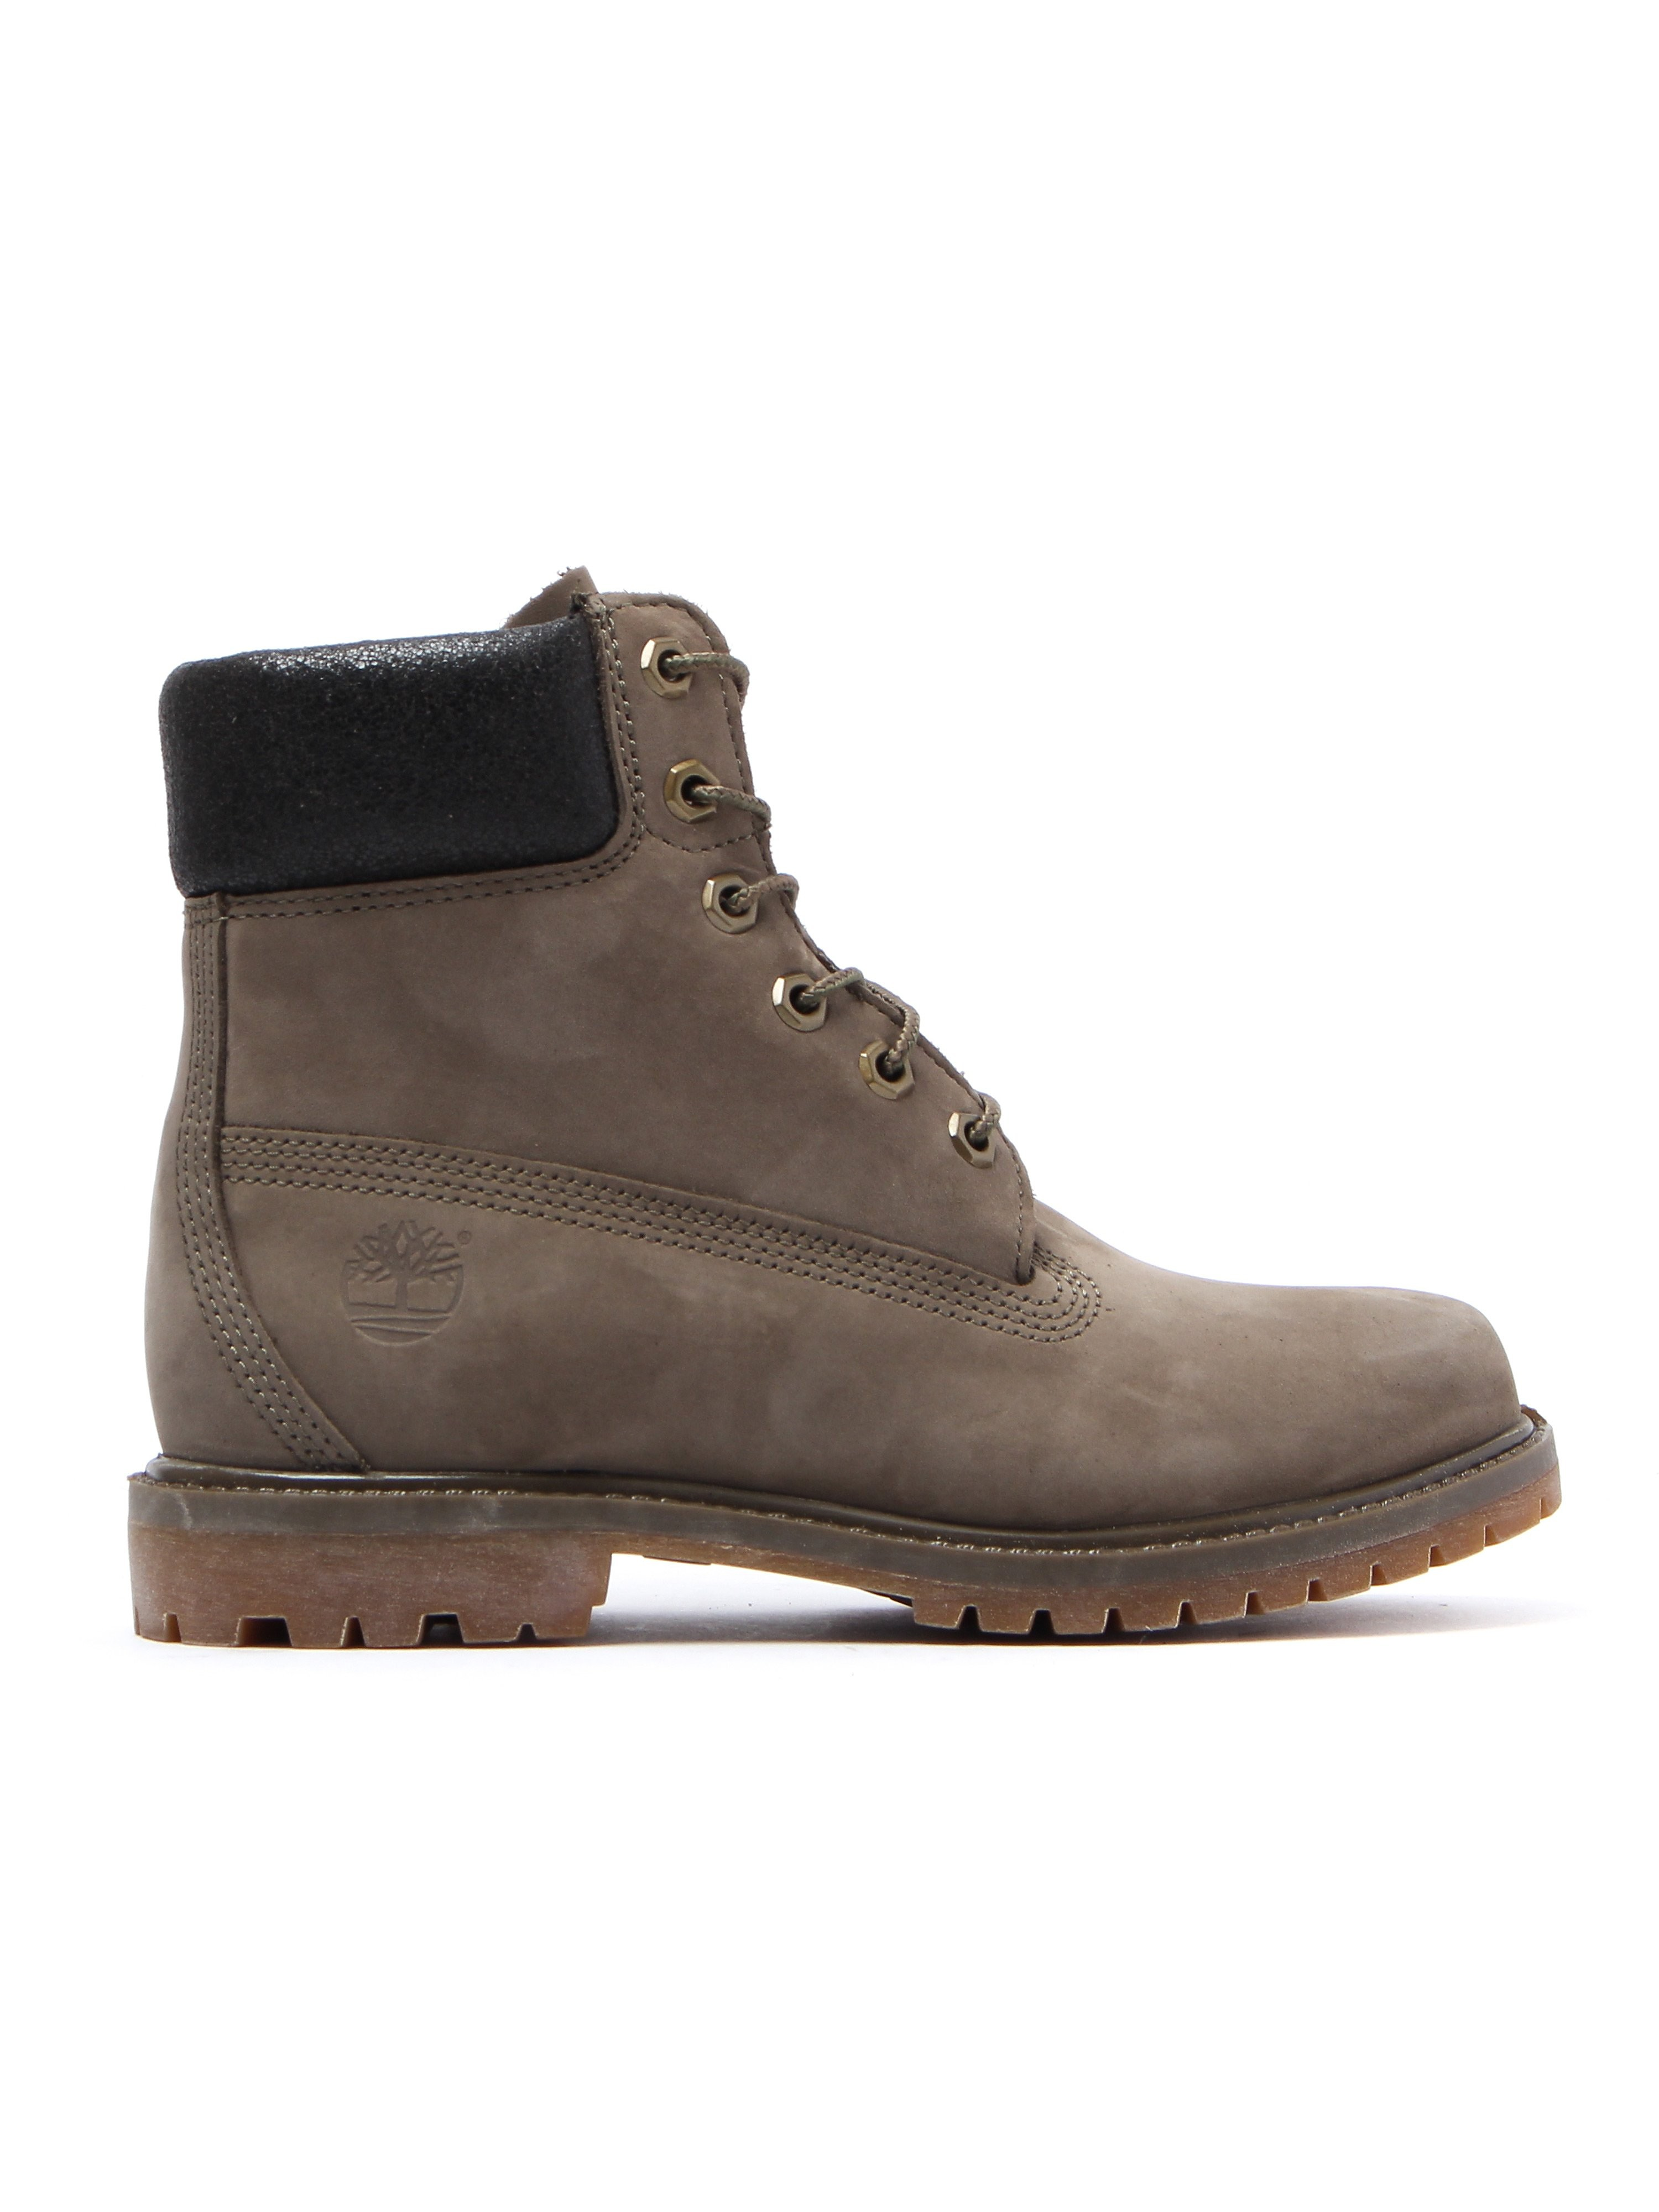 Timberland Women's 6 Inch Premium Boots - Olive Nubuck